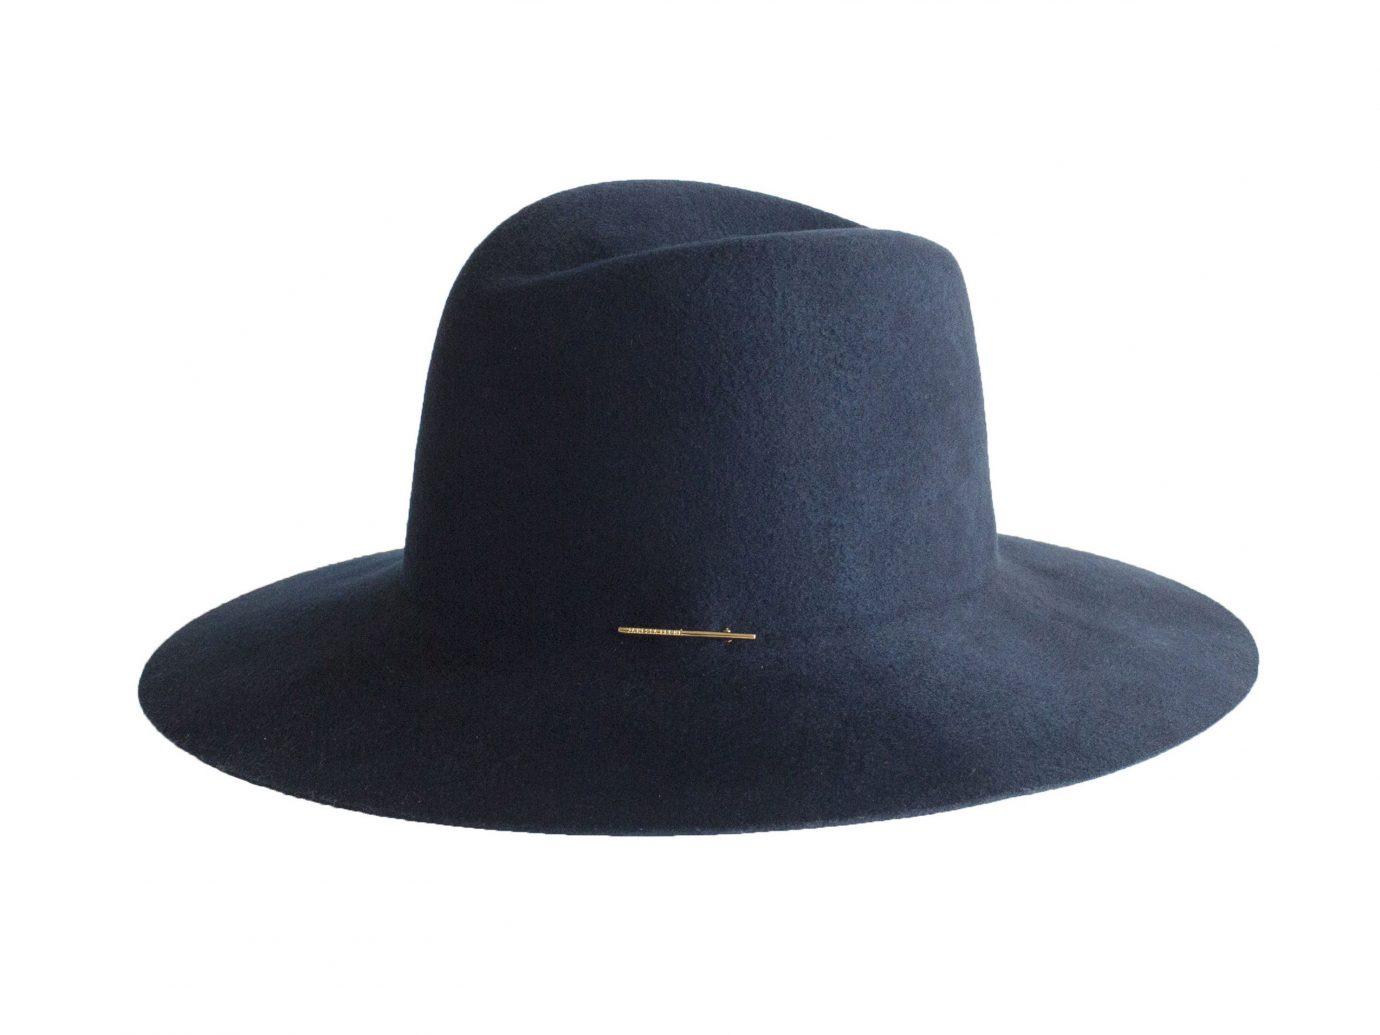 Style + Design Travel Shop hat headdress clothing black headgear product design fedora product